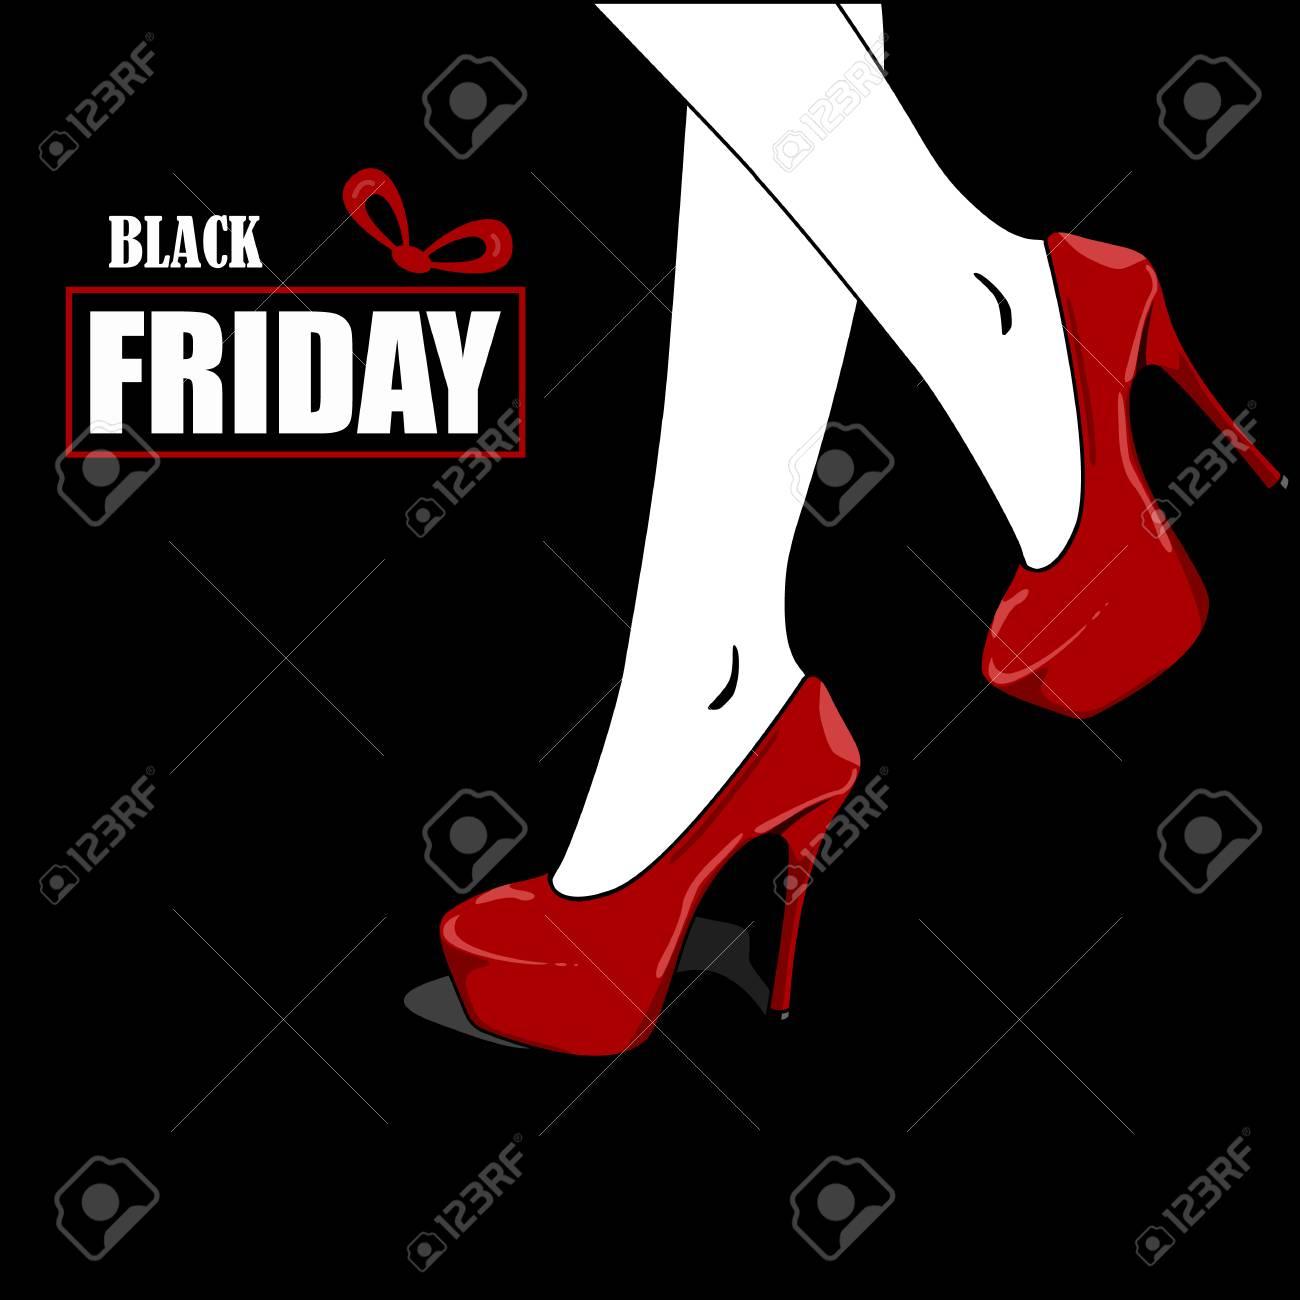 Black Friday Sale Poster. With Elegant